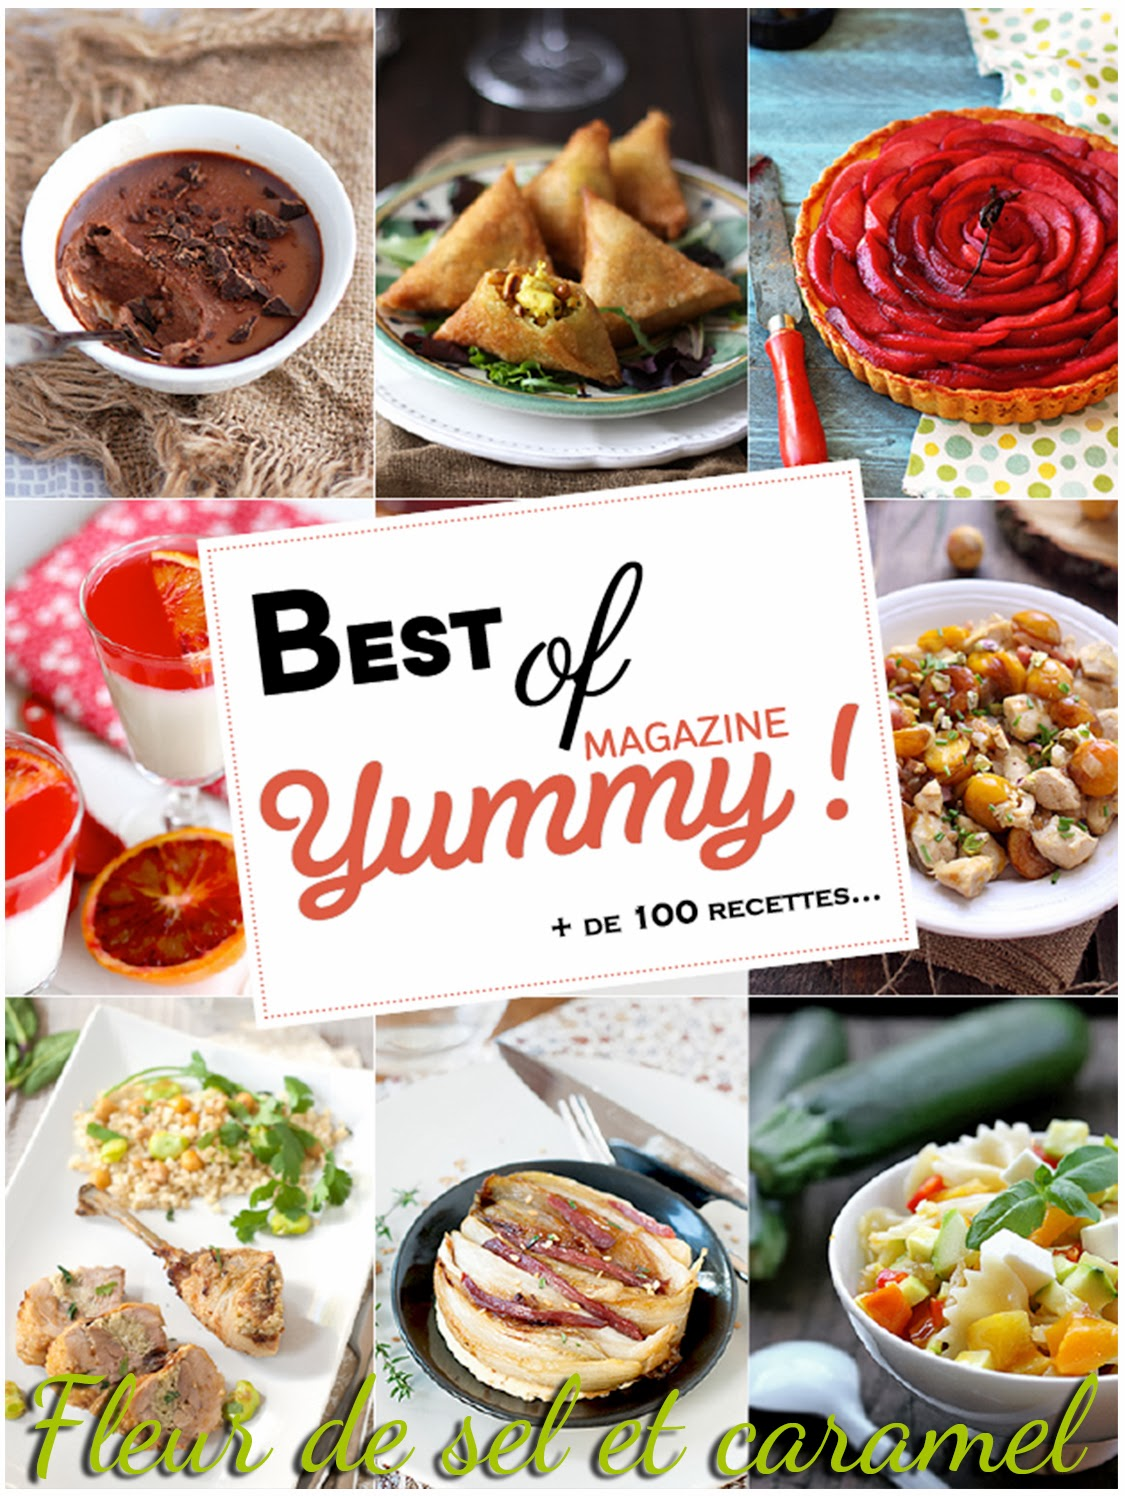 Best of de Yummy magazine